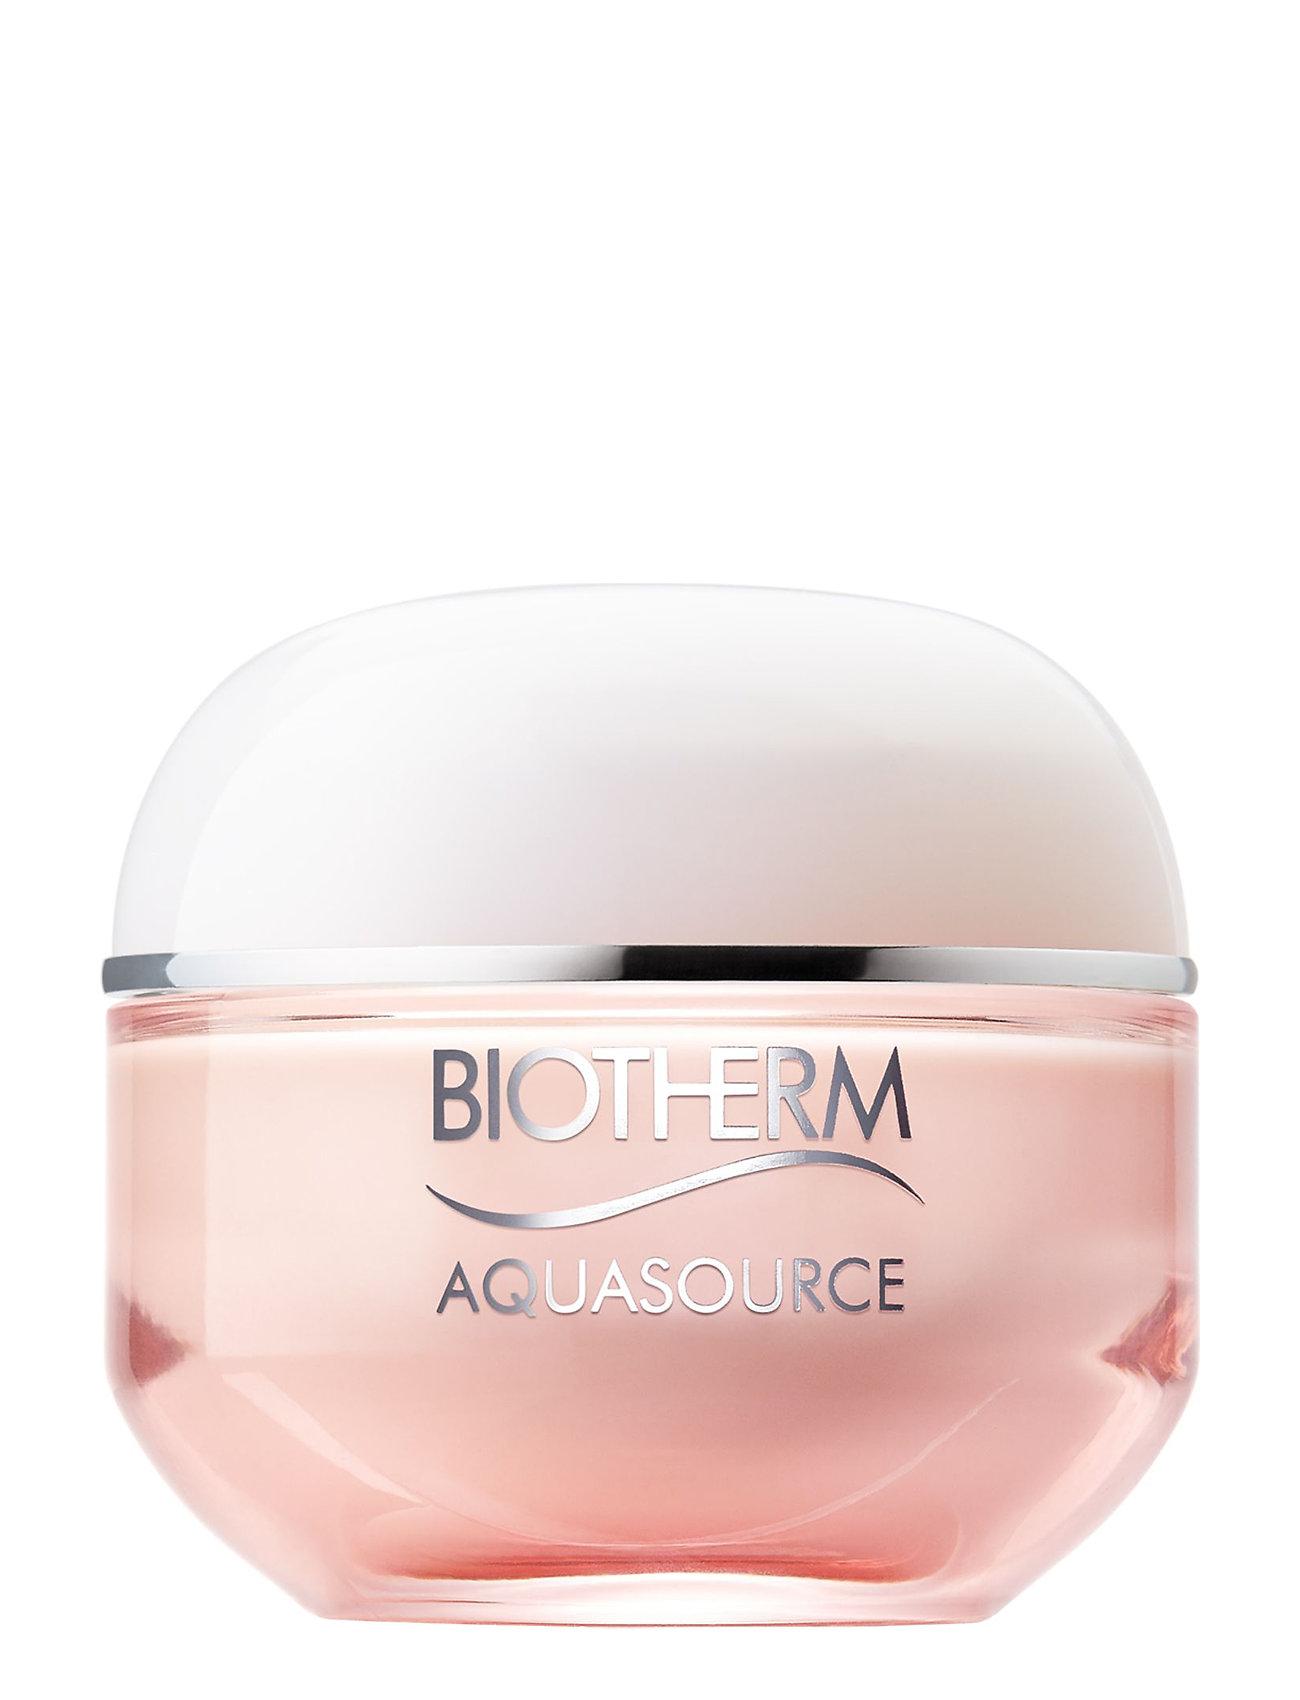 biotherm – Aquasource day cream - dry skin 50 ml. på boozt.com dk